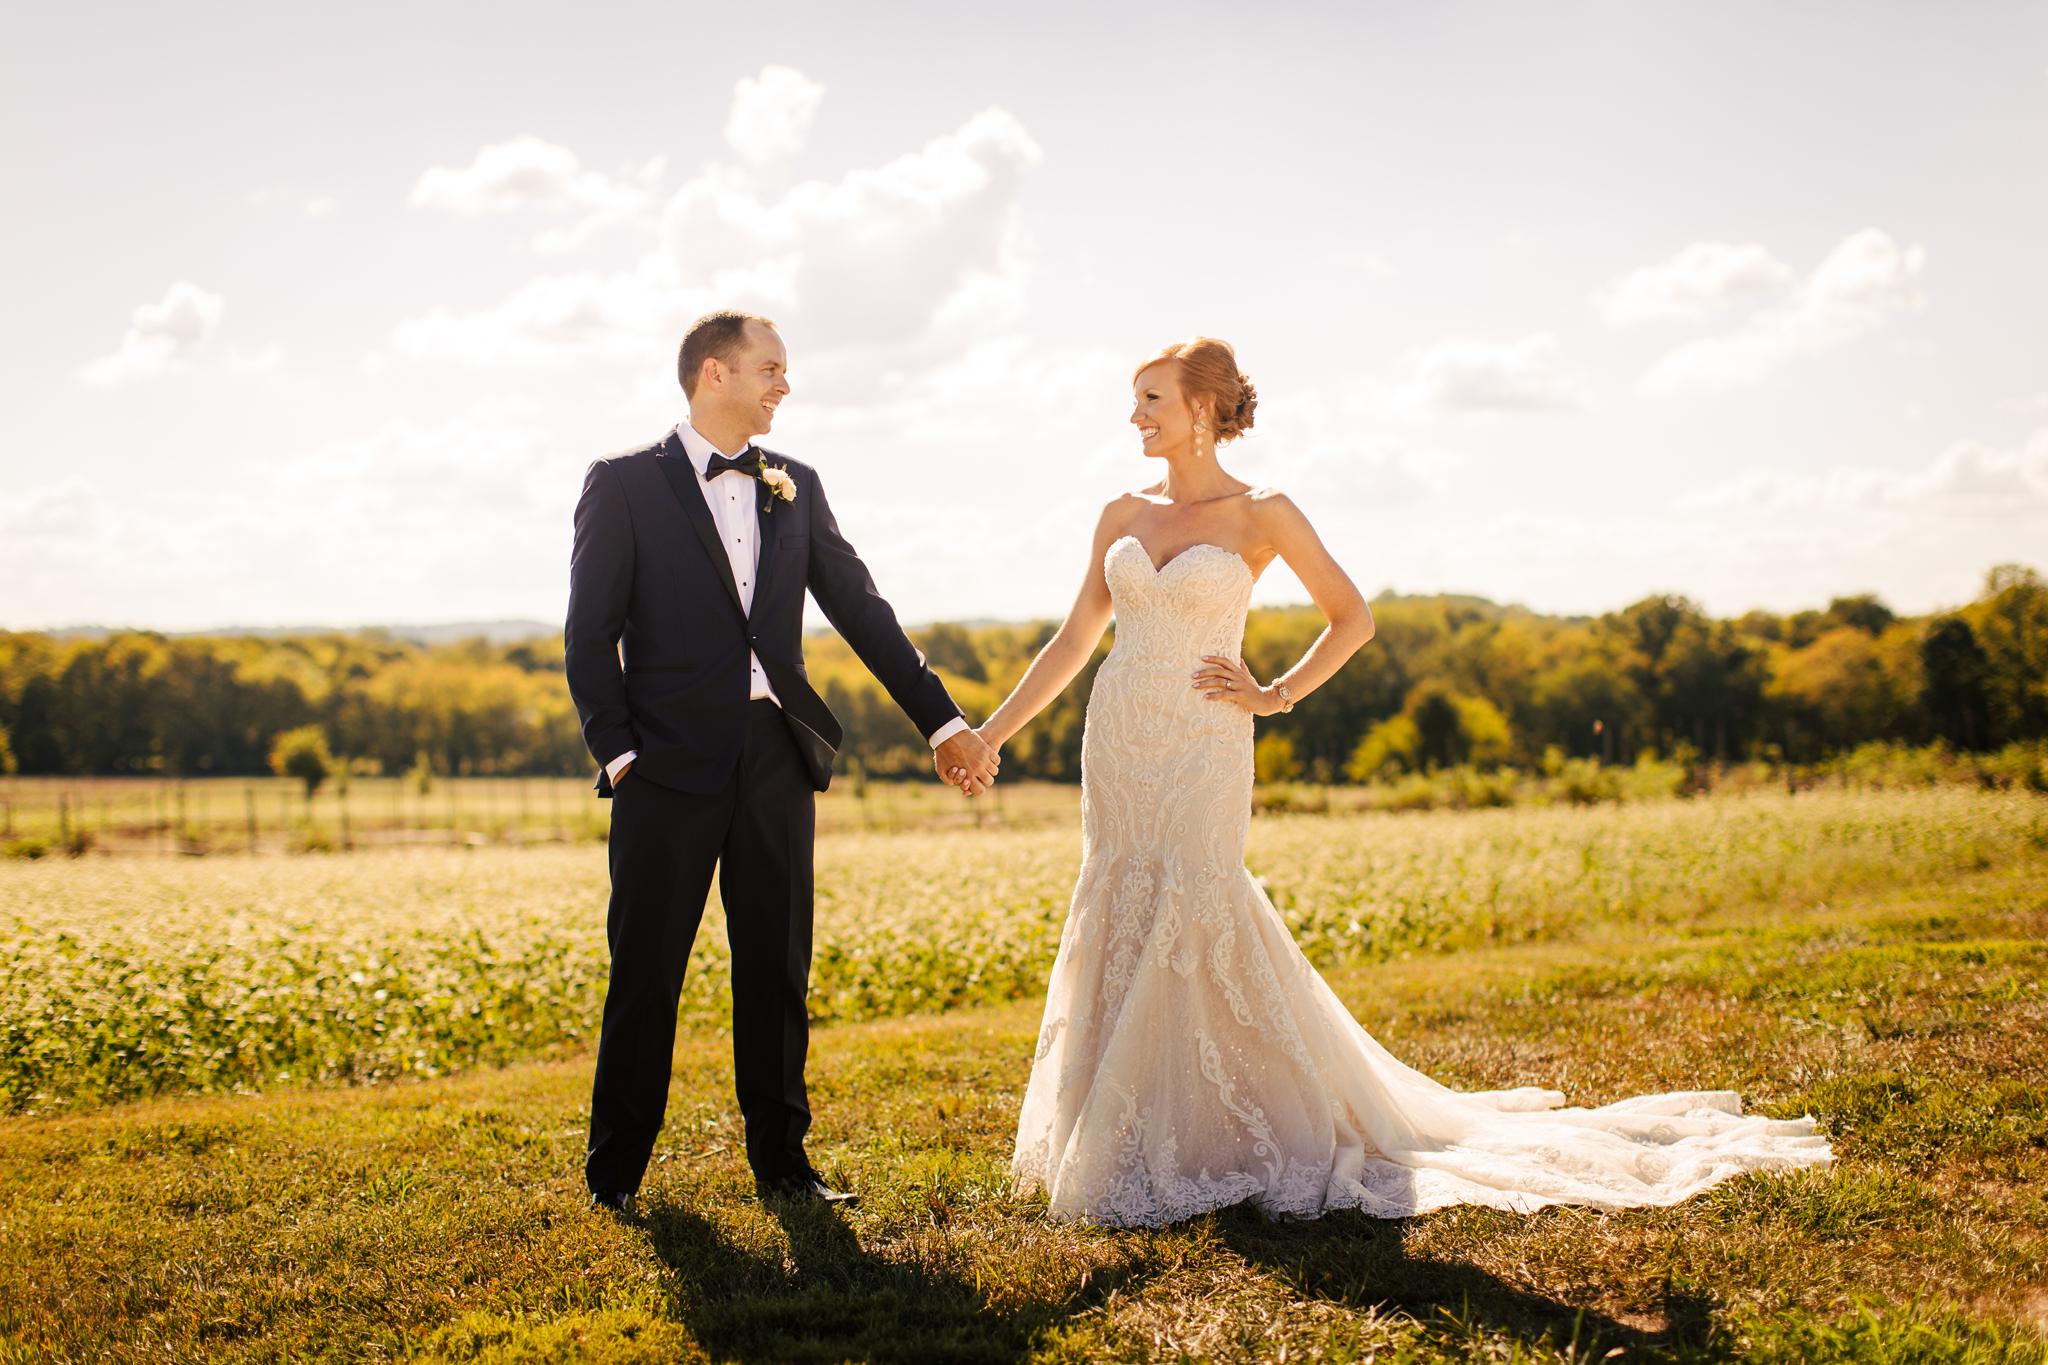 192-CK-Photo-Recher-wedding-WEB.jpg